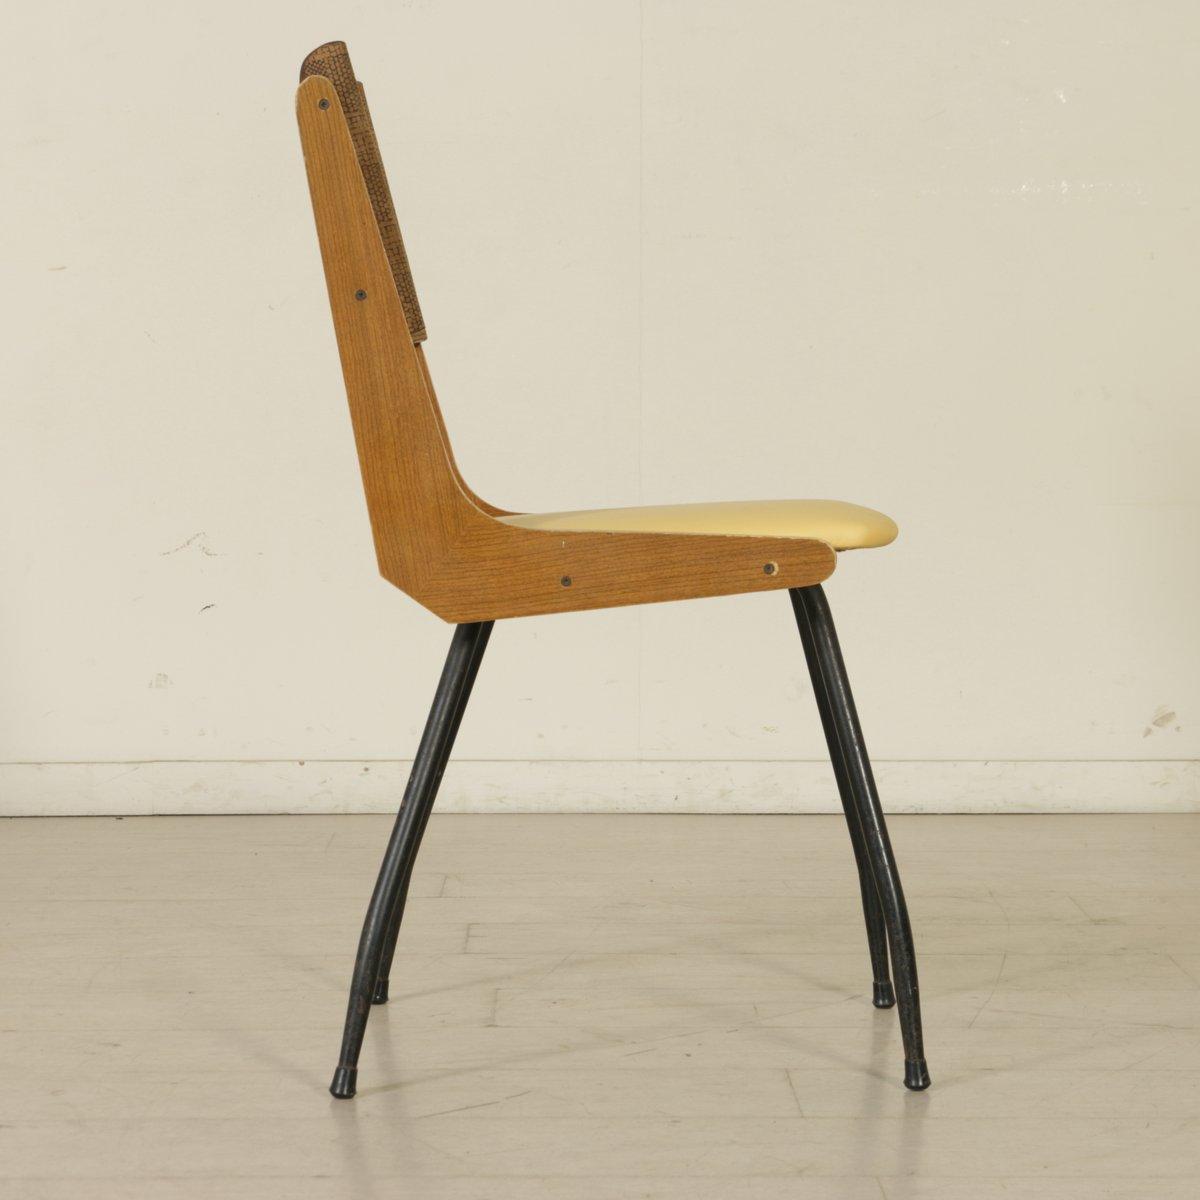 italienische vintage eichenholz st hle mit bezug 5er set. Black Bedroom Furniture Sets. Home Design Ideas